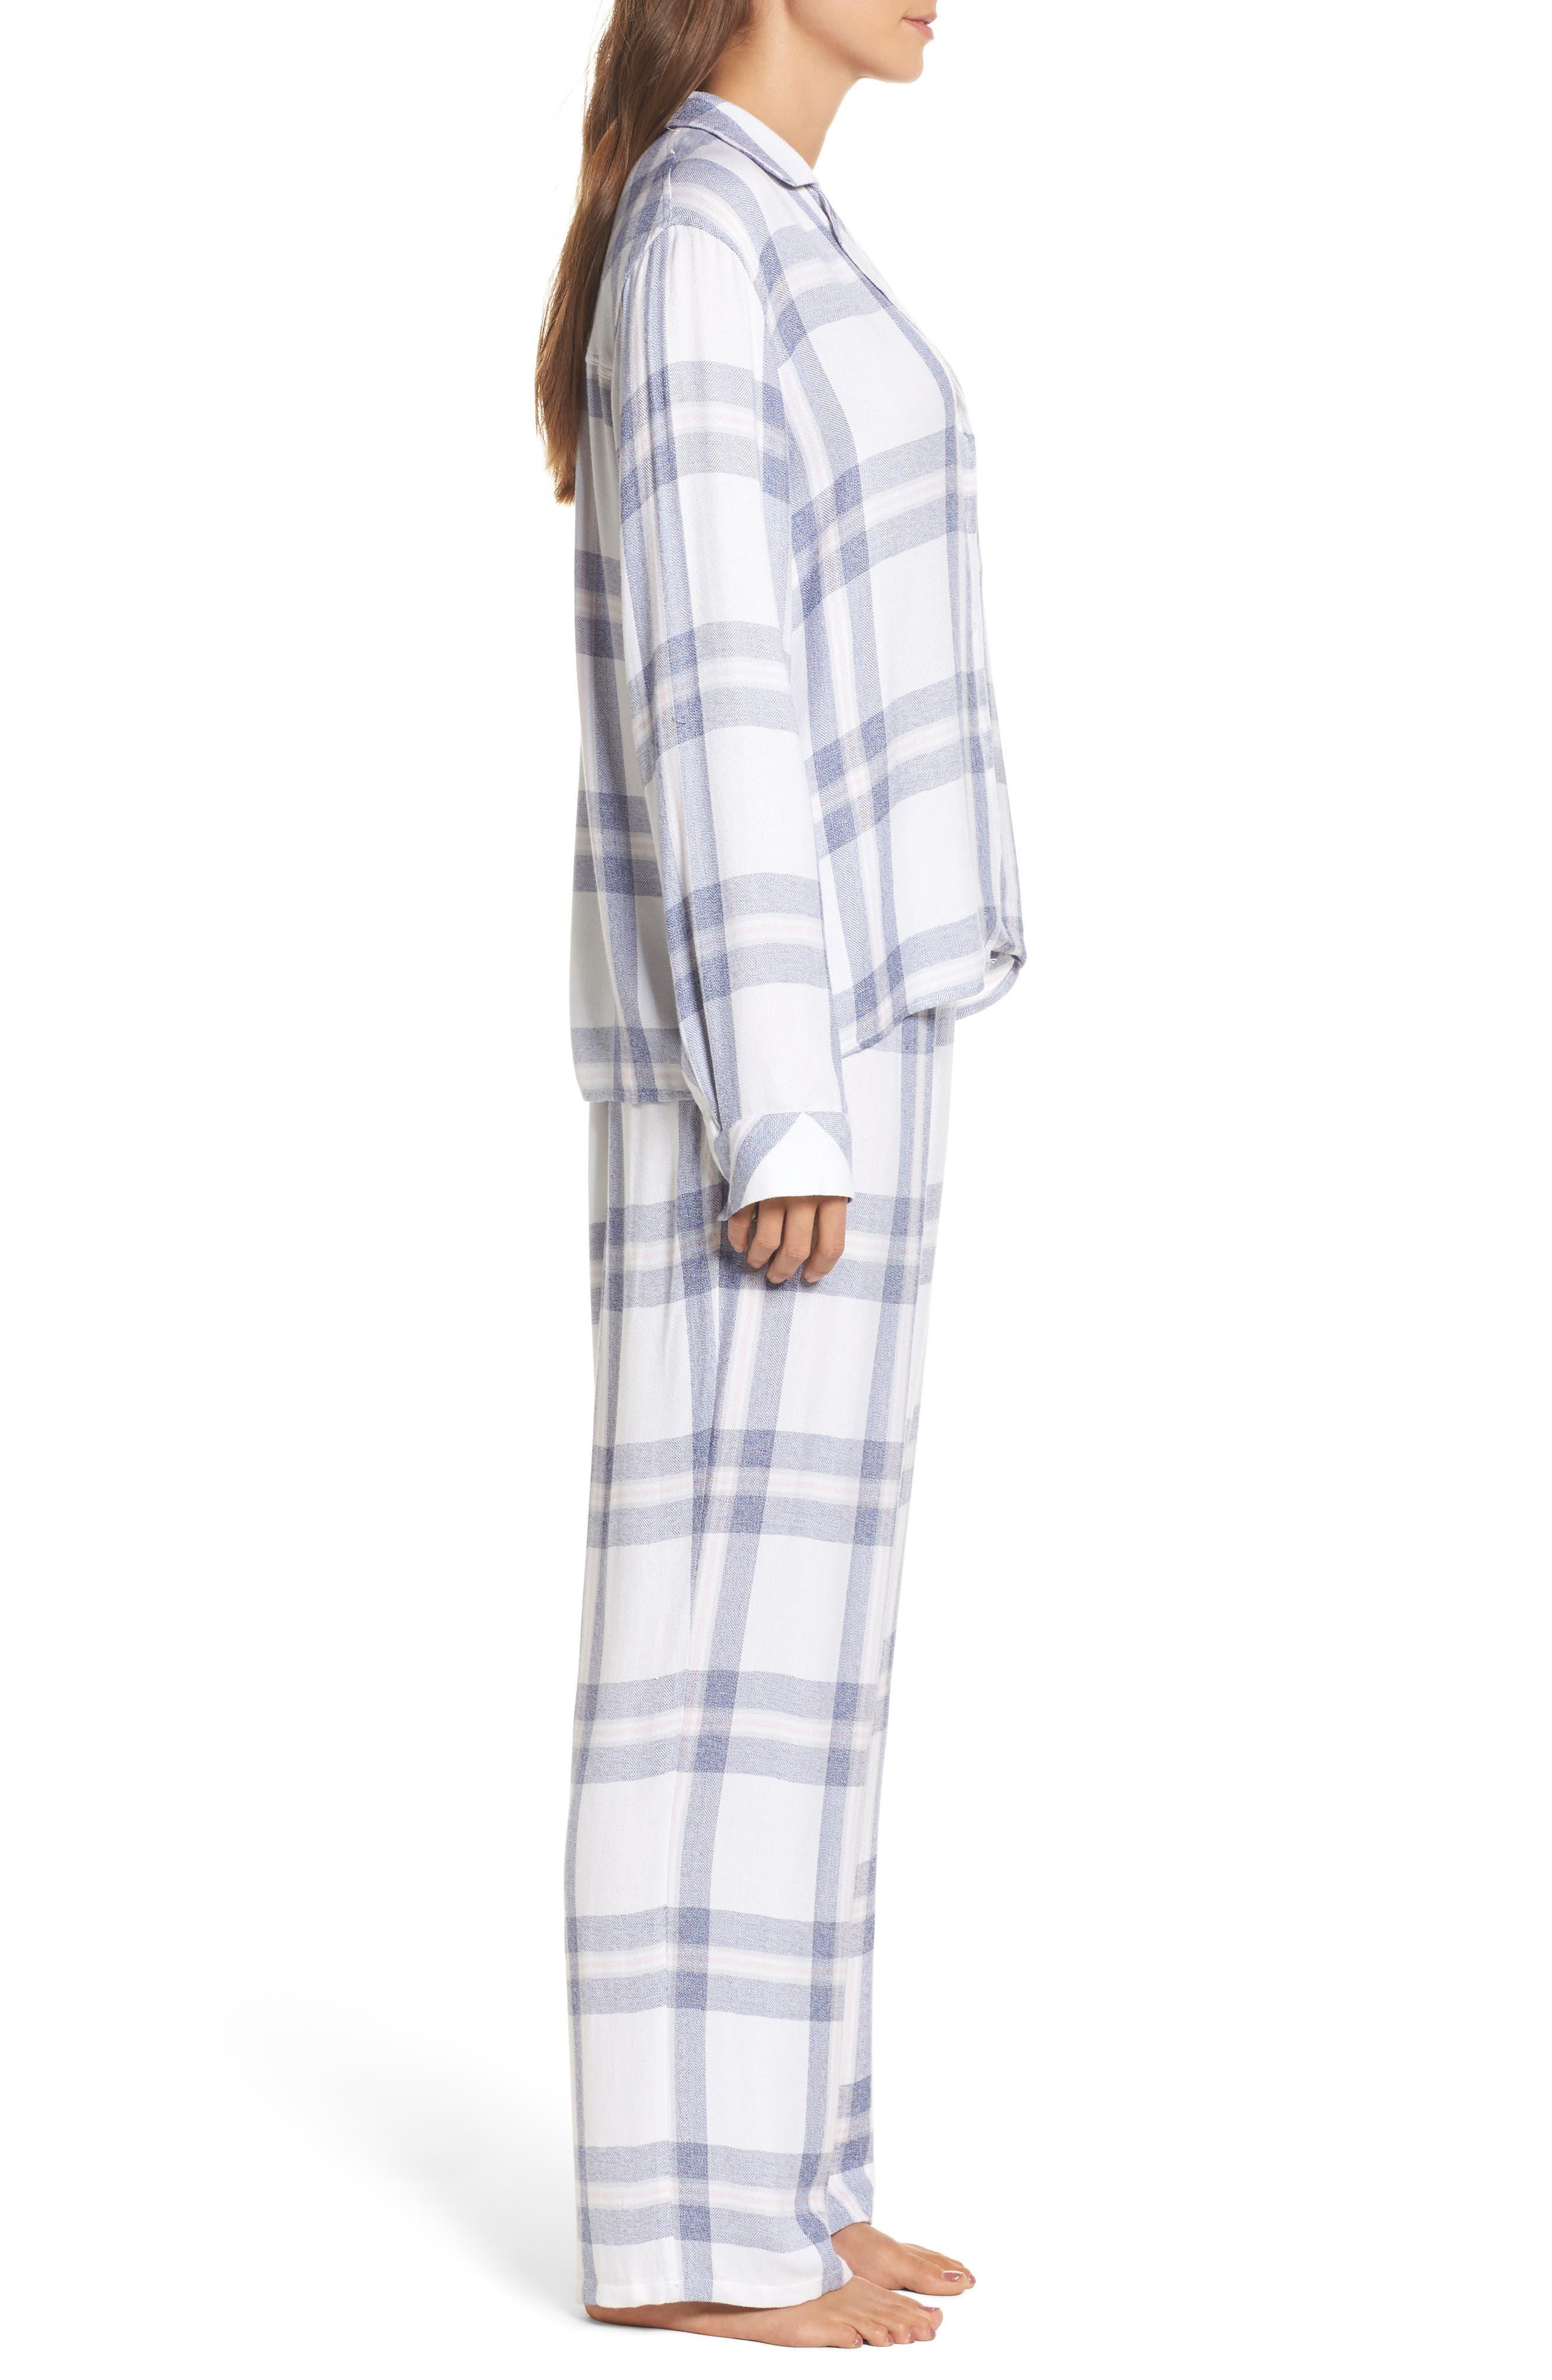 Plaid Pajamas,                             Alternate thumbnail 3, color,                             WHITE/ CHAMBRAY/ PETAL